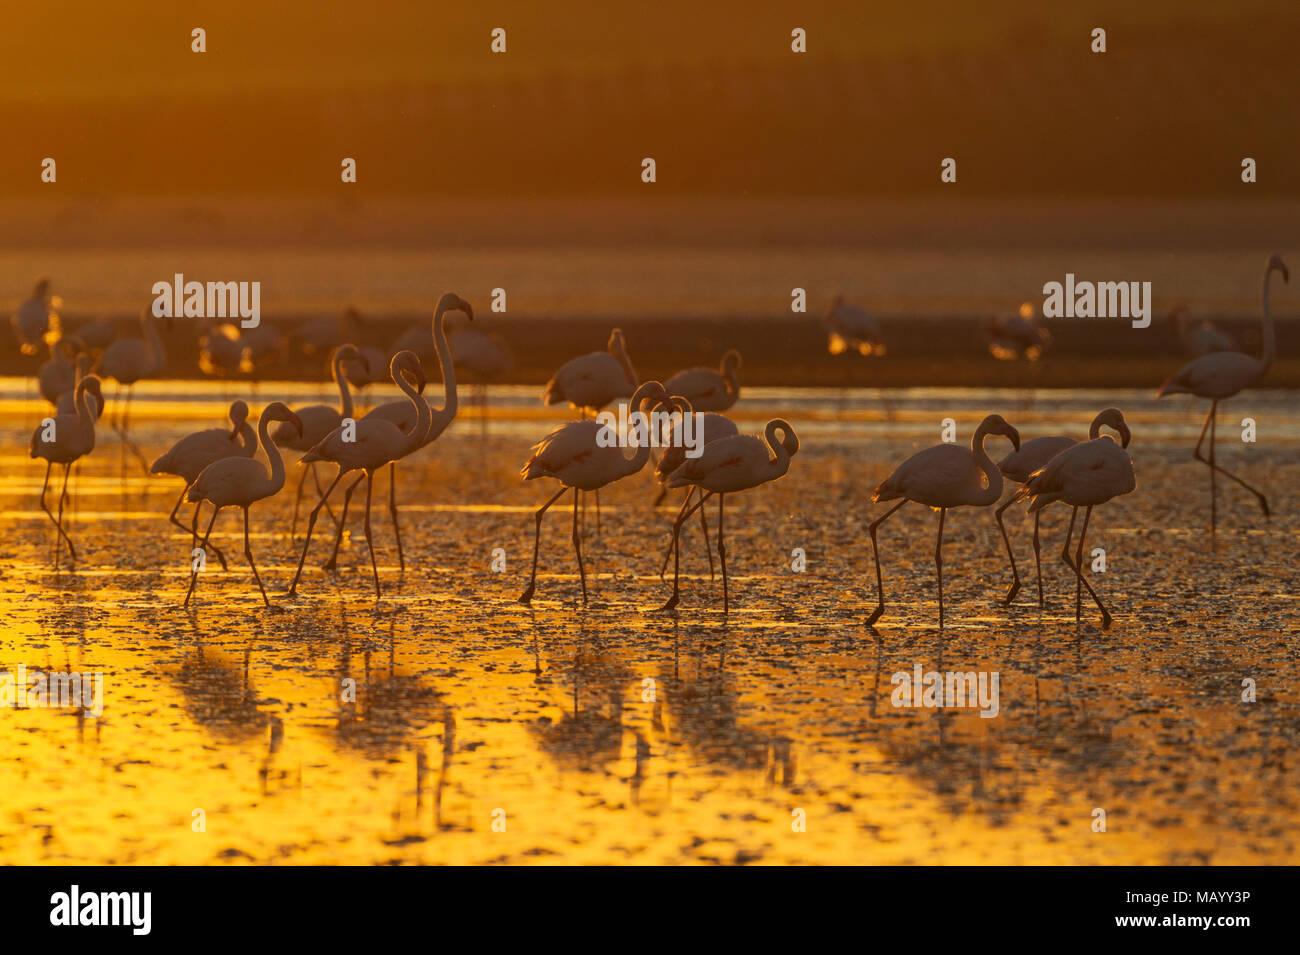 Greater Flamingos (Phoenicopterus roseus), at sunset, Laguna de Fuente de Piedra, Malaga province, Andalusia, Spain - Stock Image